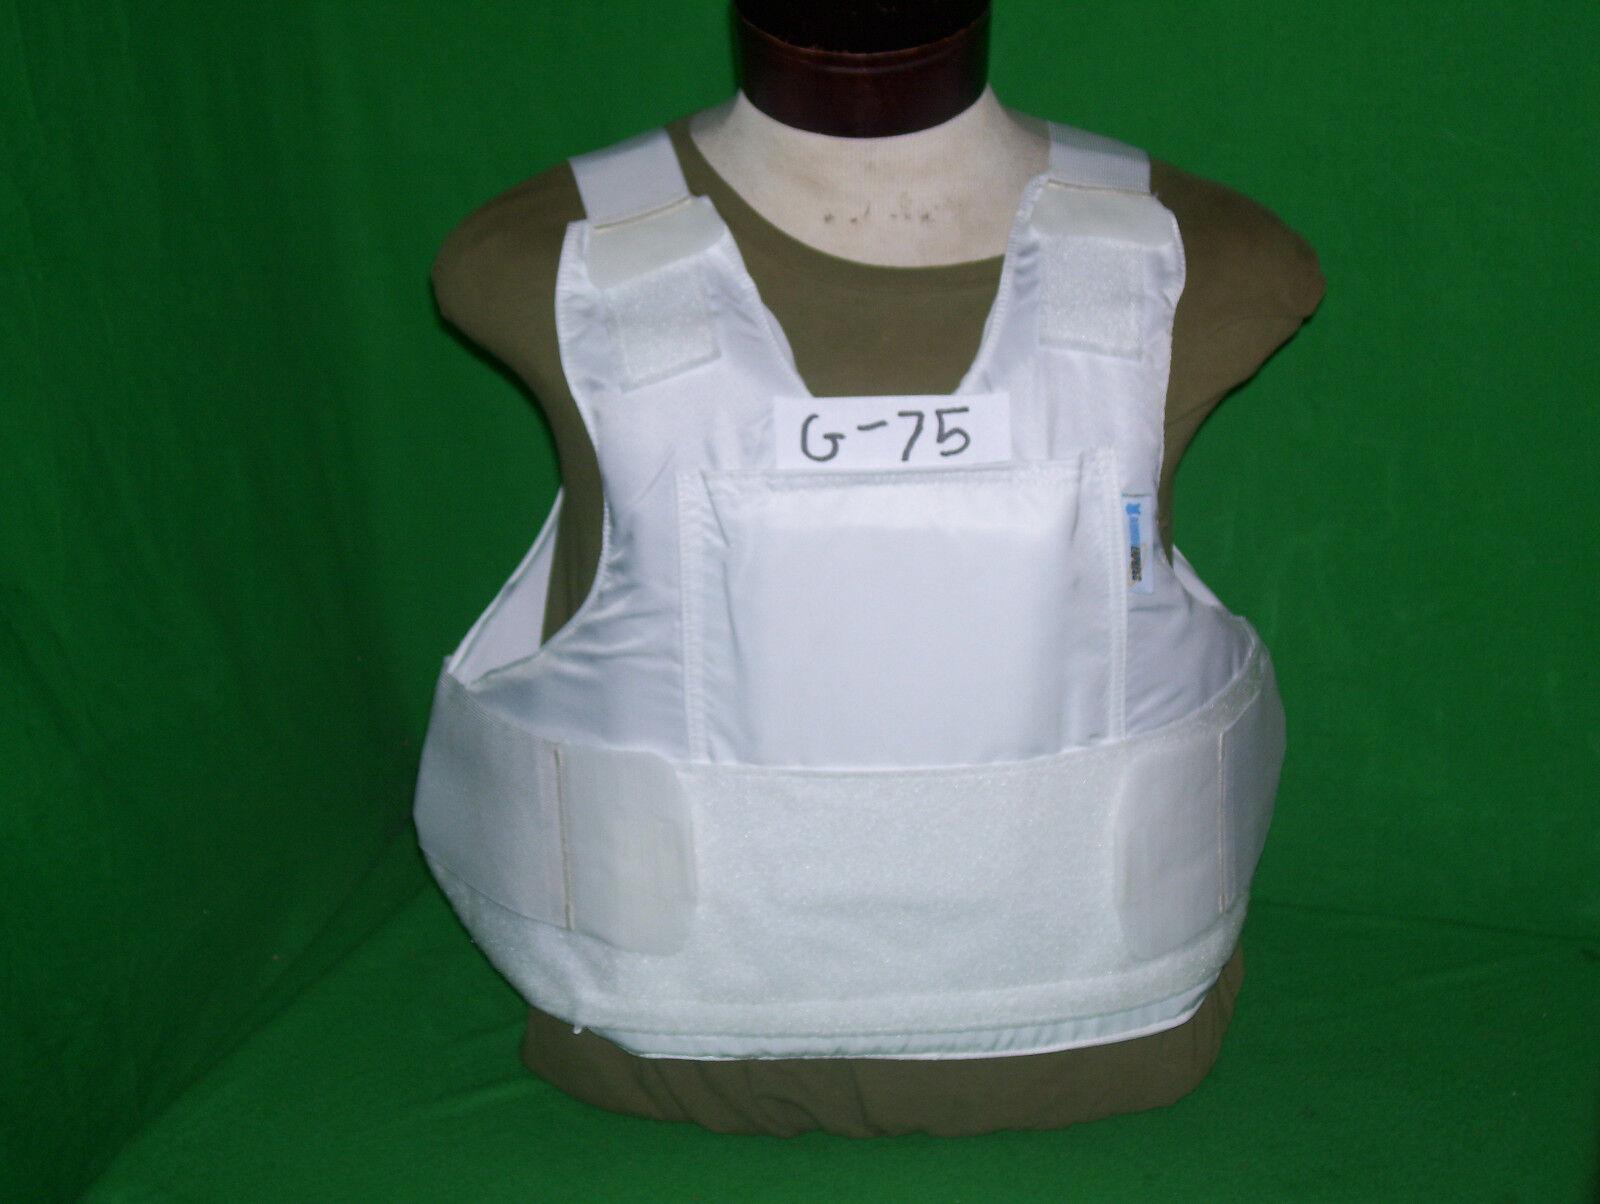 Armor Express Armor Bullet Proof Vest Level IIIA-X-Large-REG NOS 2015+5X8  G-75